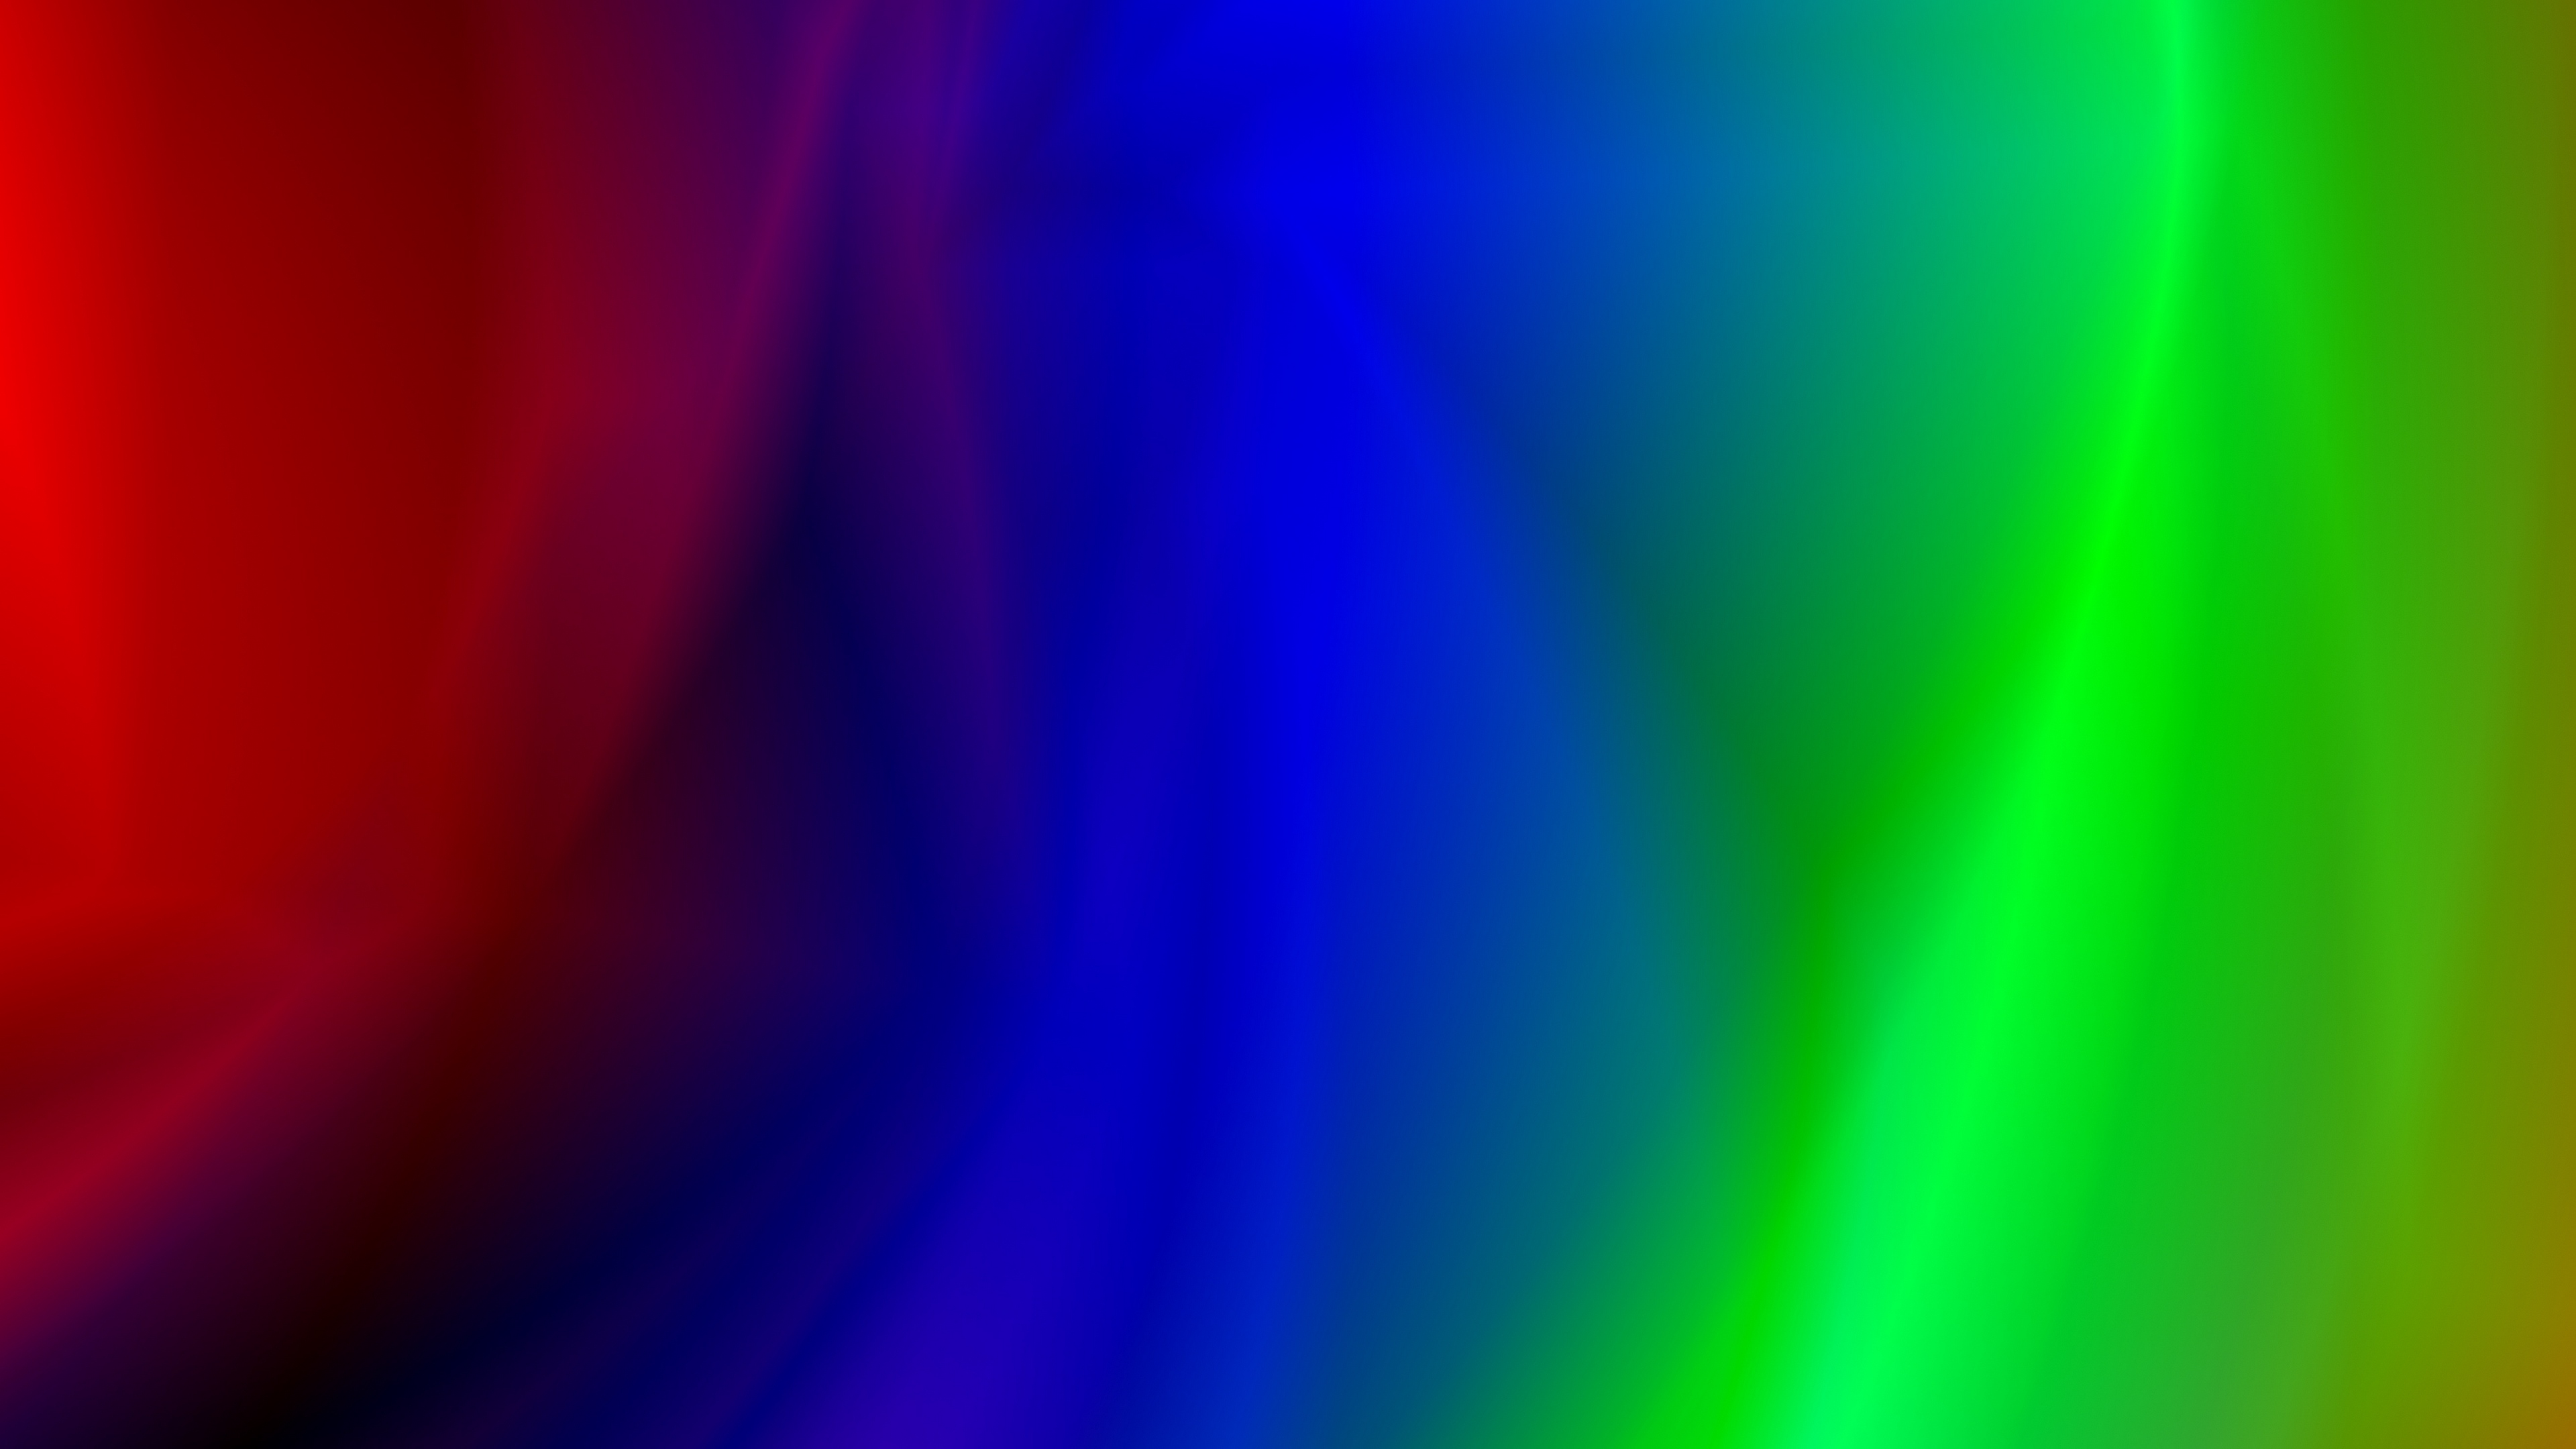 graphics gradient colorful 4k 1539369656 - graphics, gradient, colorful 4k - Graphics, Gradient, Colorful